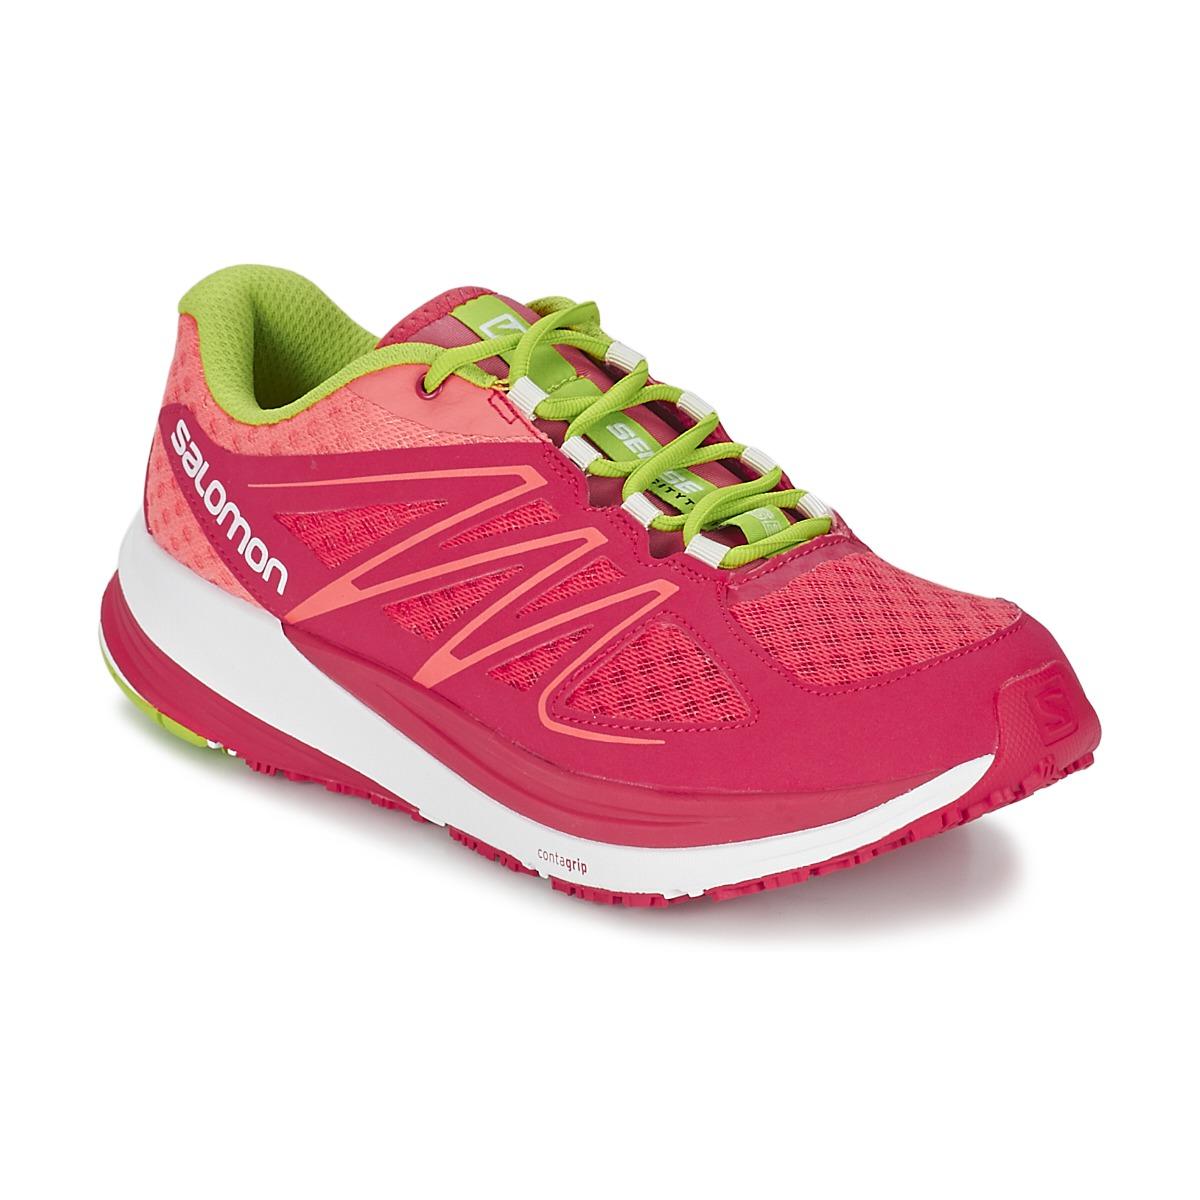 Chaussures-de-running Salomon SENSE PULSE WOMAN Rose / Orange / Vert